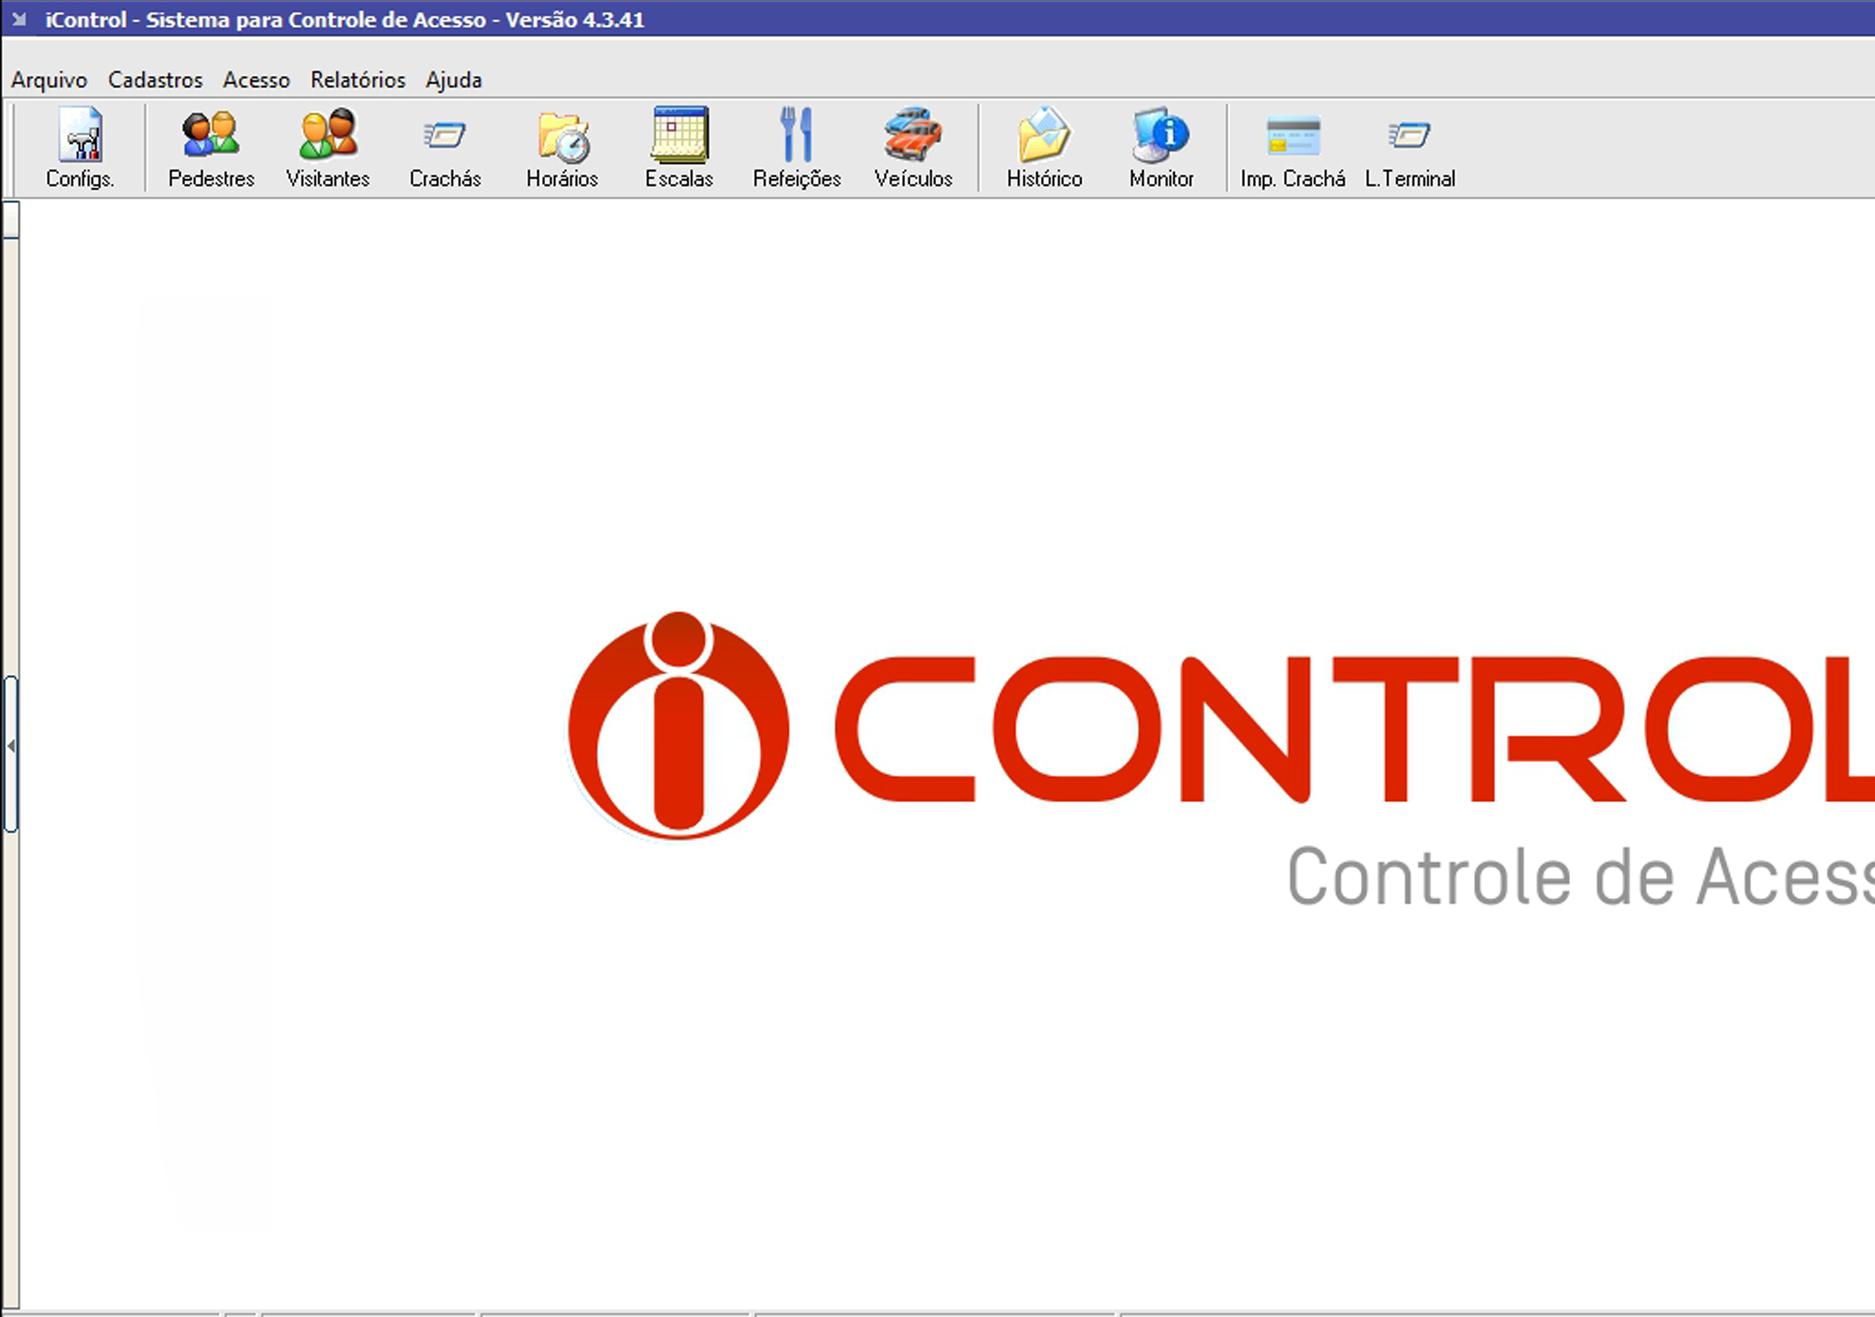 Icontrol02